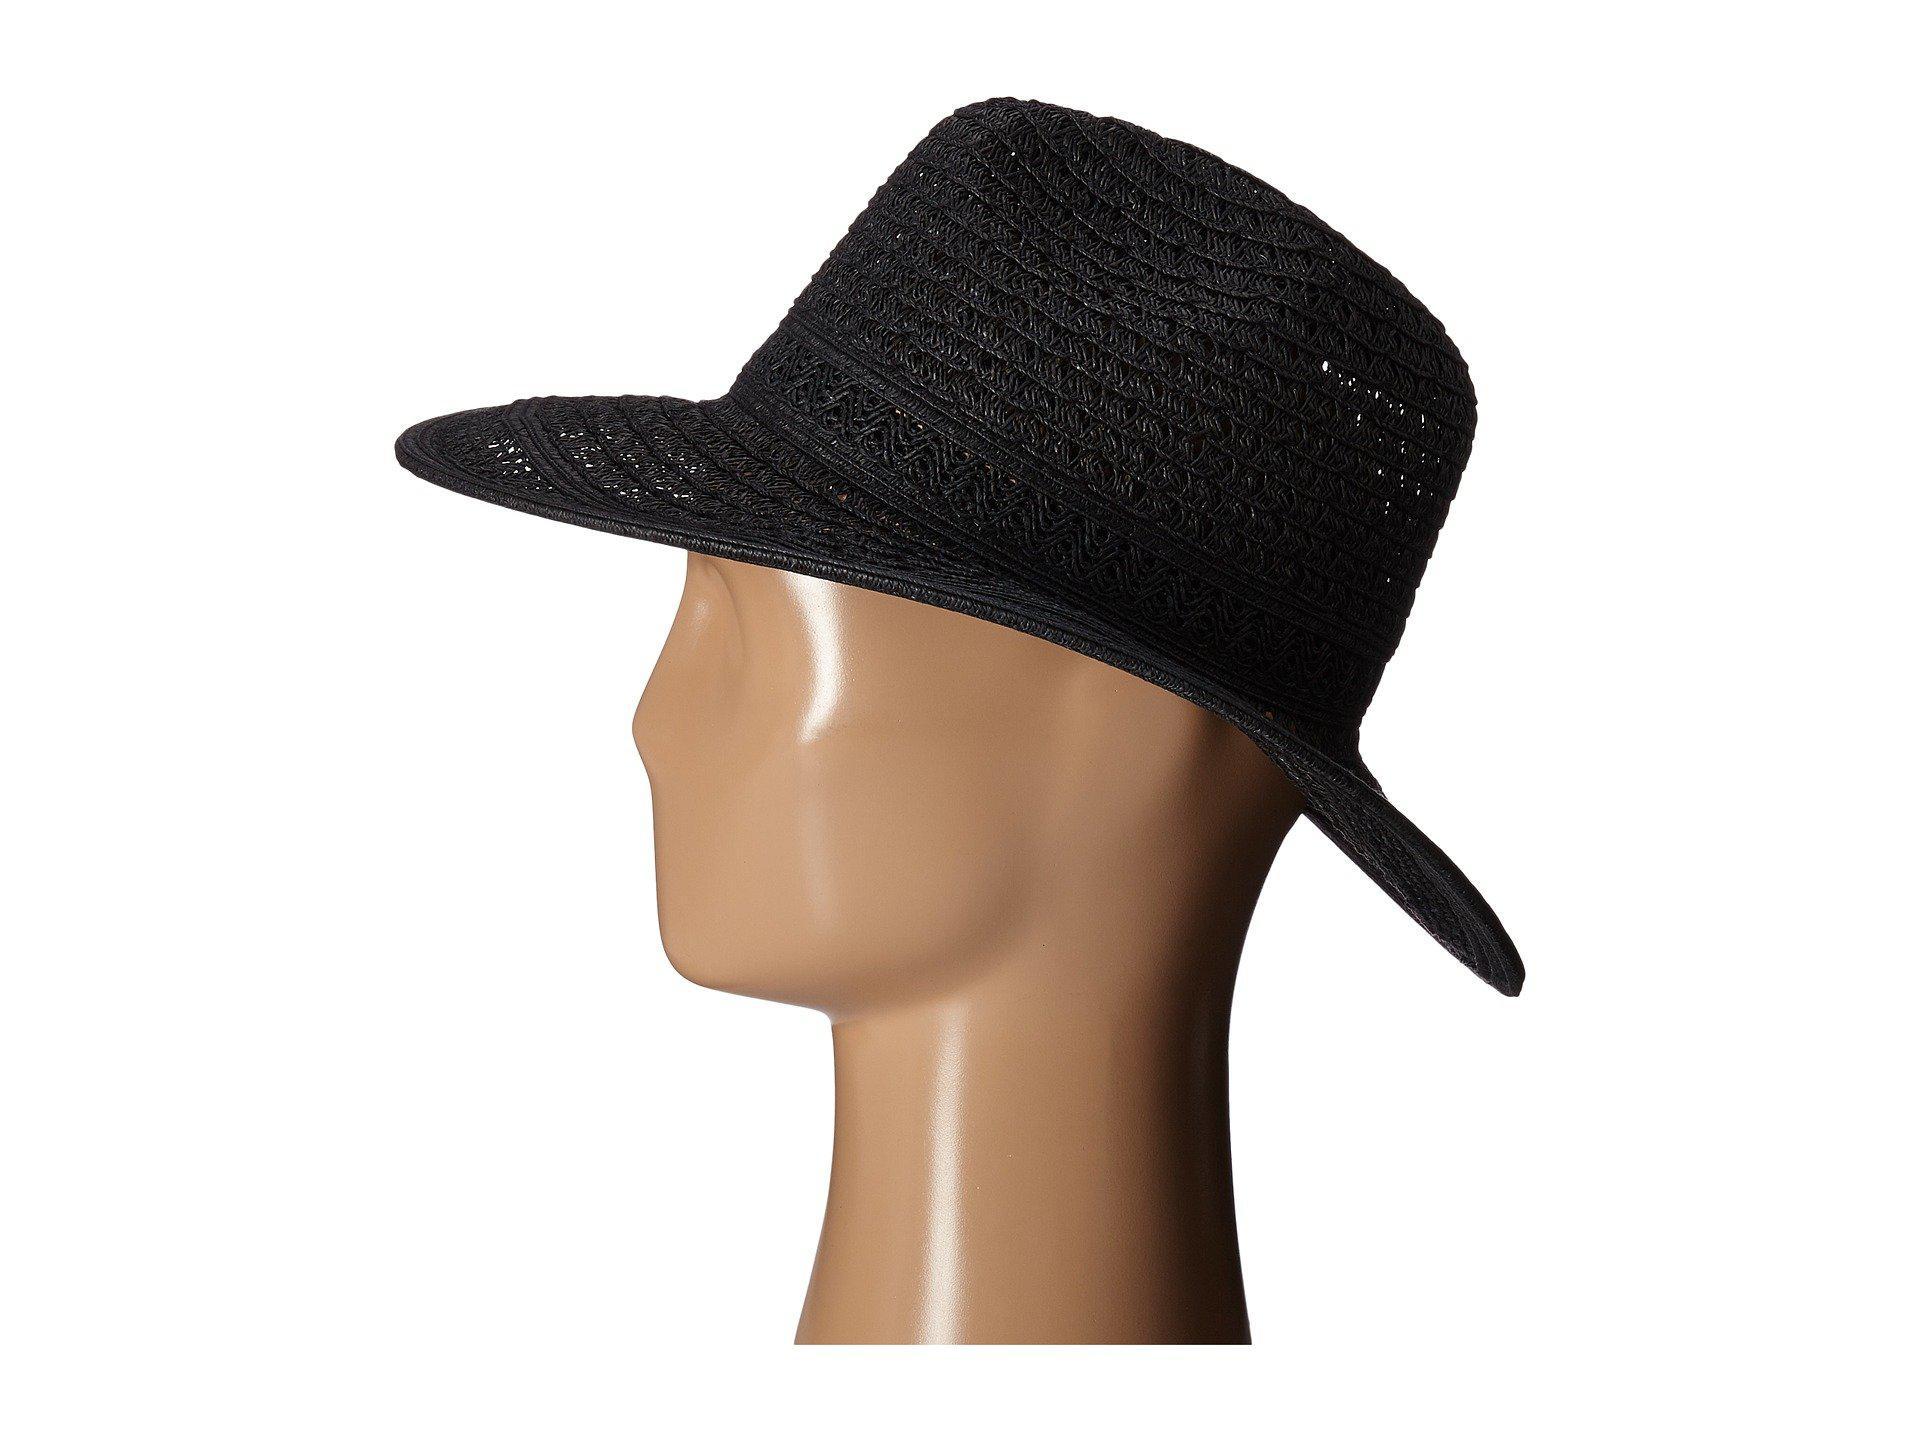 Lyst - San Diego Hat Company Ubm4452 Open Weave Panama Sun Hat in ... 0d0037797c49